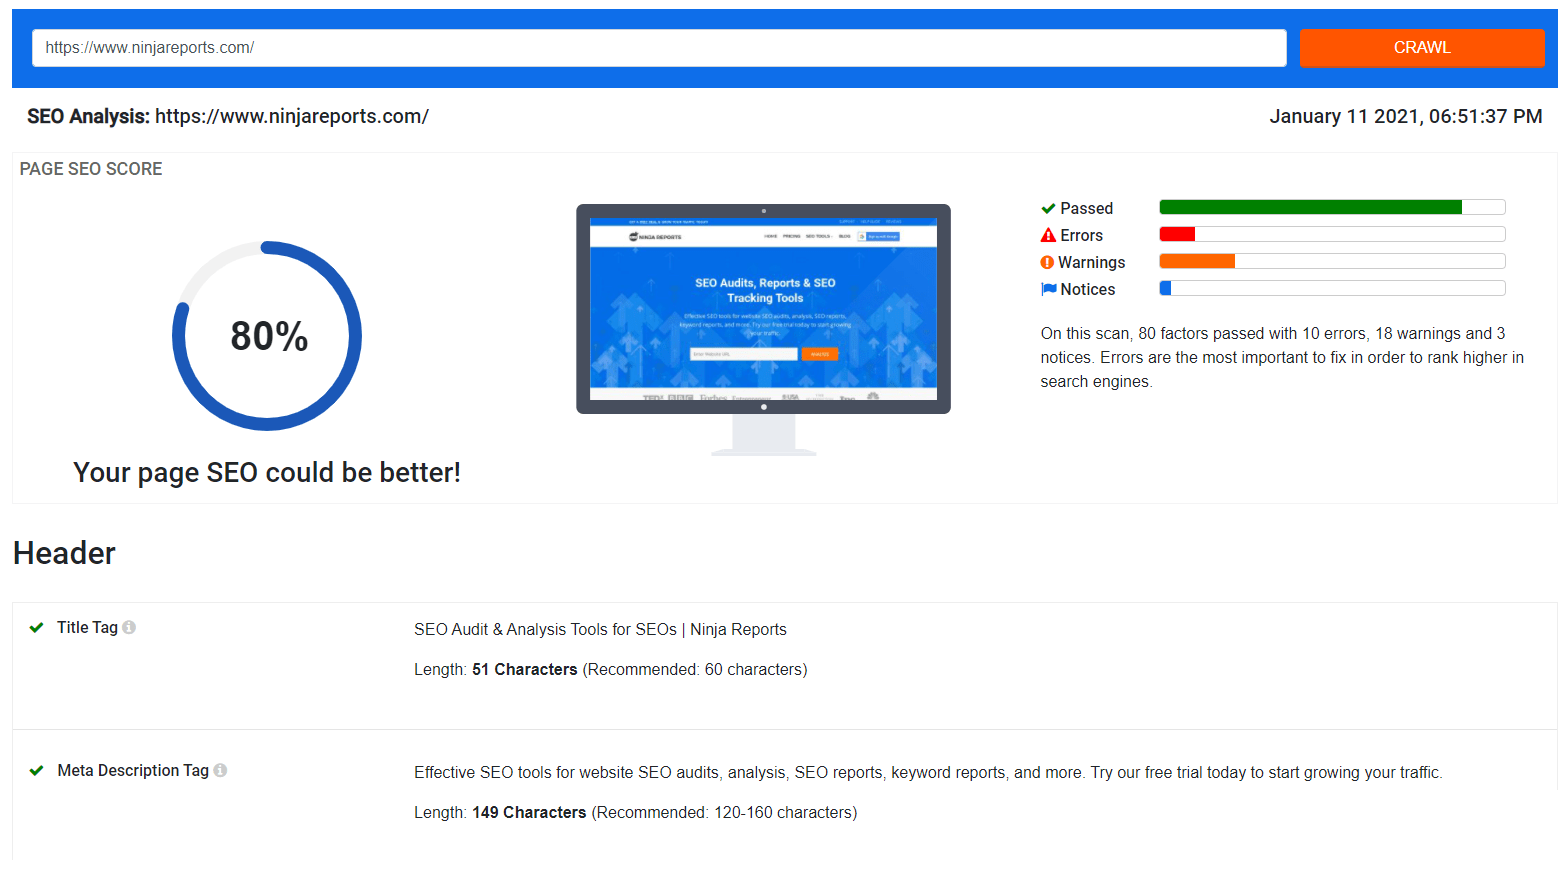 ninja reports seo checker tool